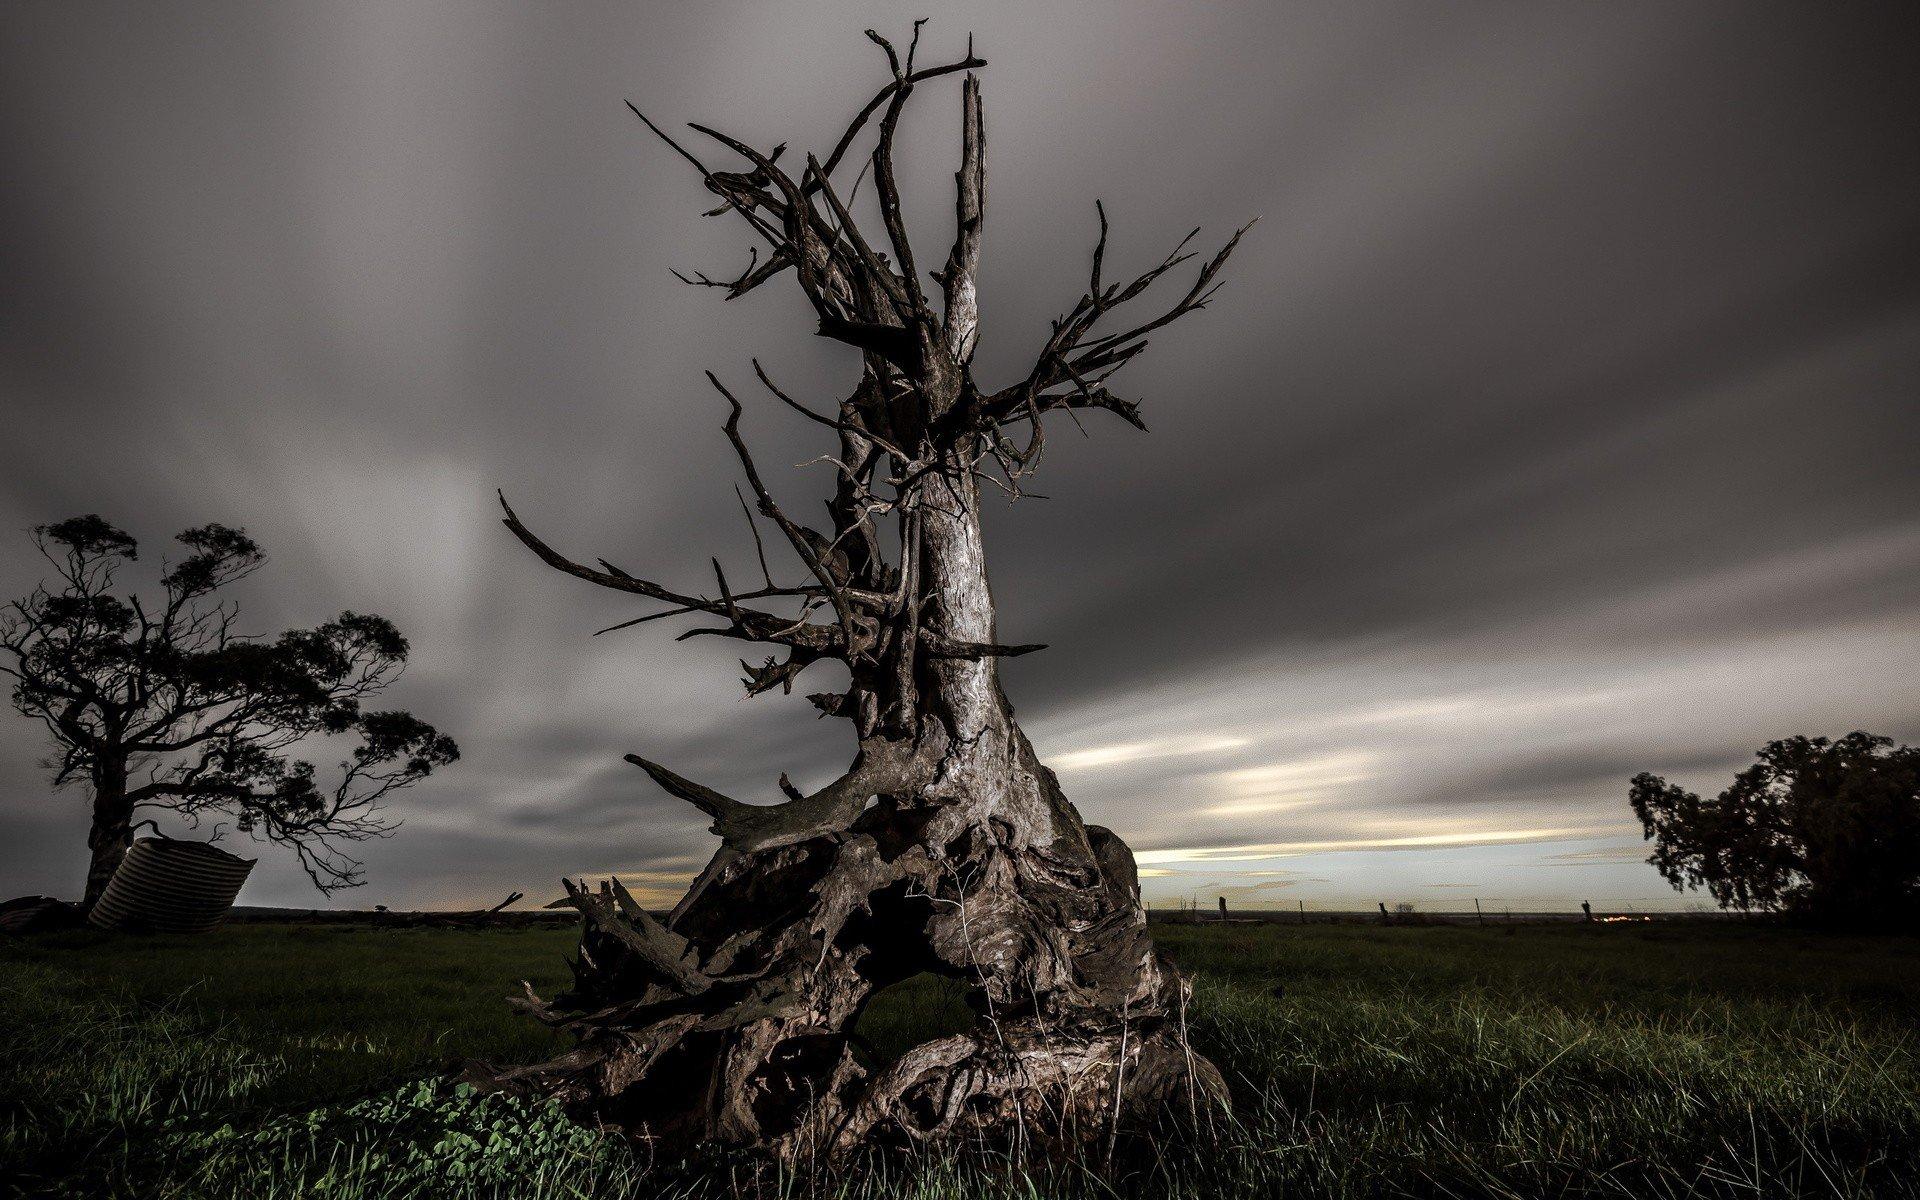 nature, Landscape, Trees, Dead trees, Field, Grass, Clouds, Long exposure, Evening Wallpaper